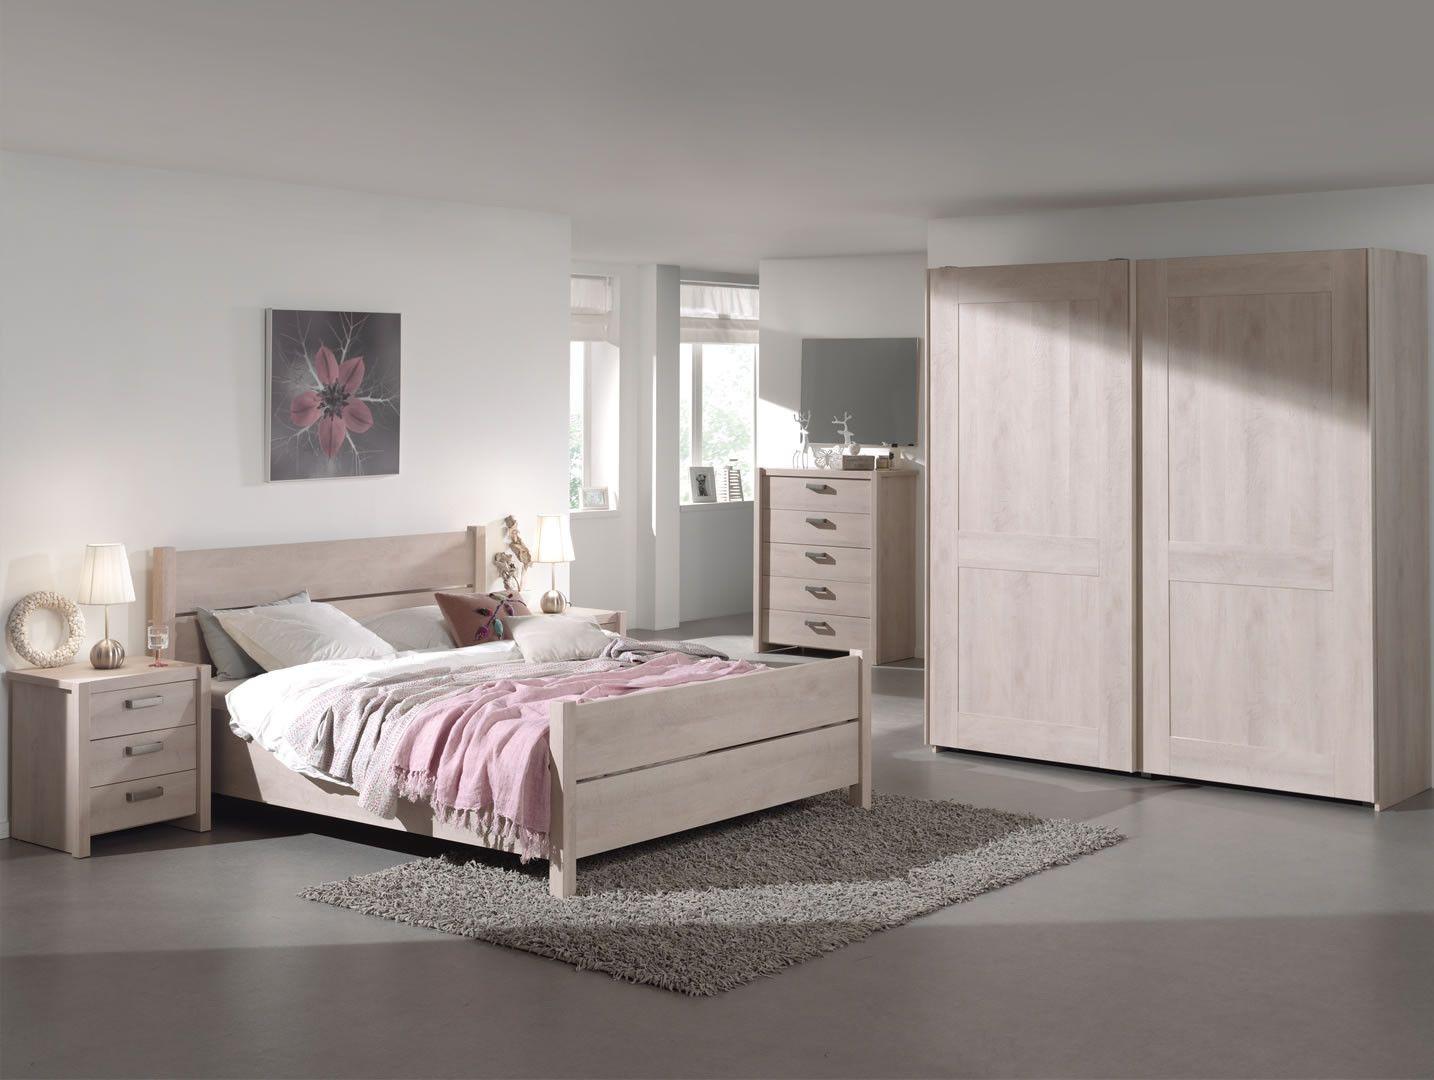 Chambre A Coucher Adulte made in belgium chambre à coucher complète adulte portes coulissantes haly  chêne clair 140 cm